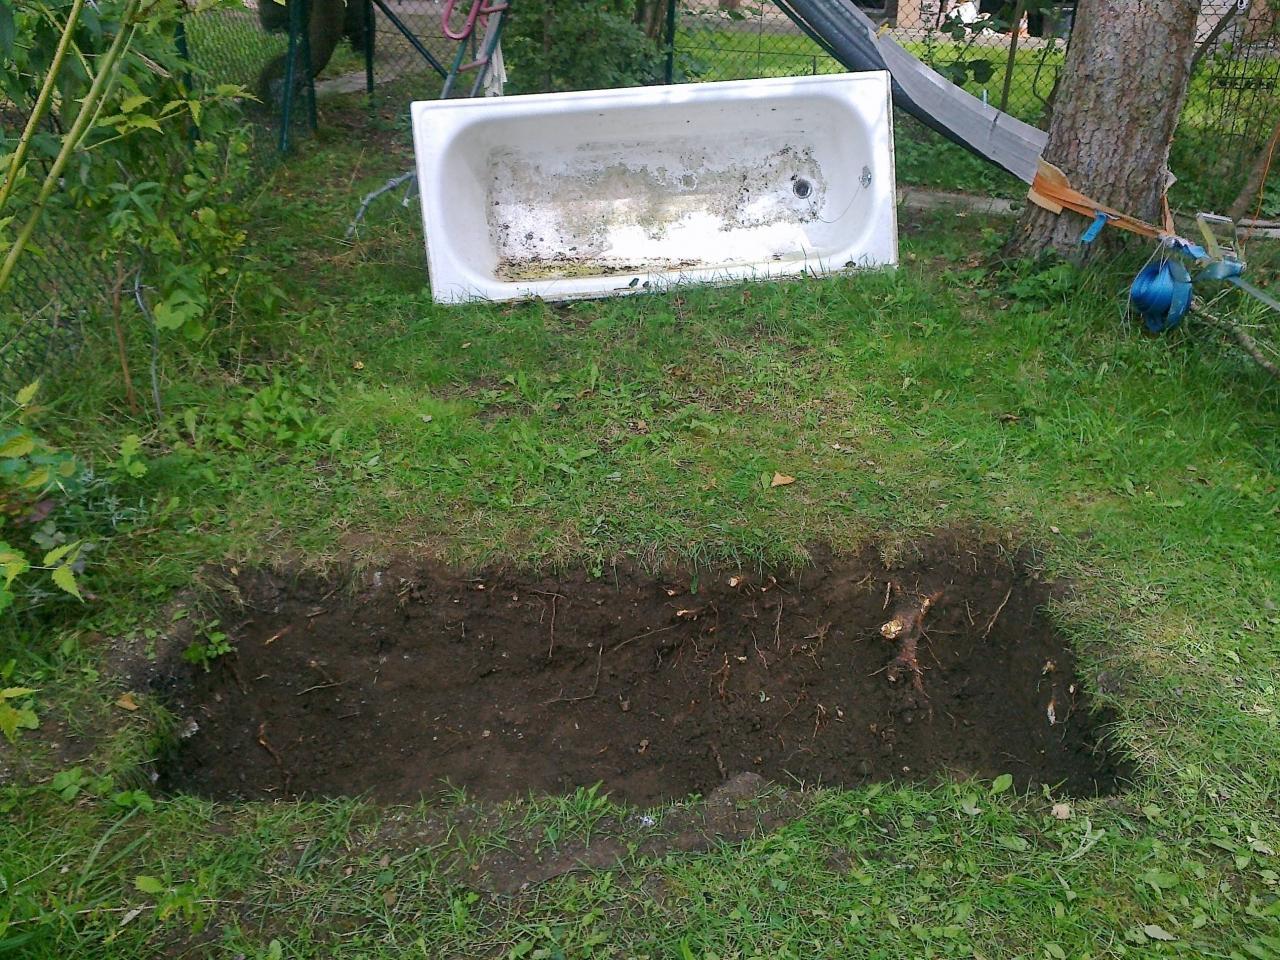 Badewanne Im Garten.Badewanne Im Garten Bauanleitung Zum Selberbauen 1 2 Do